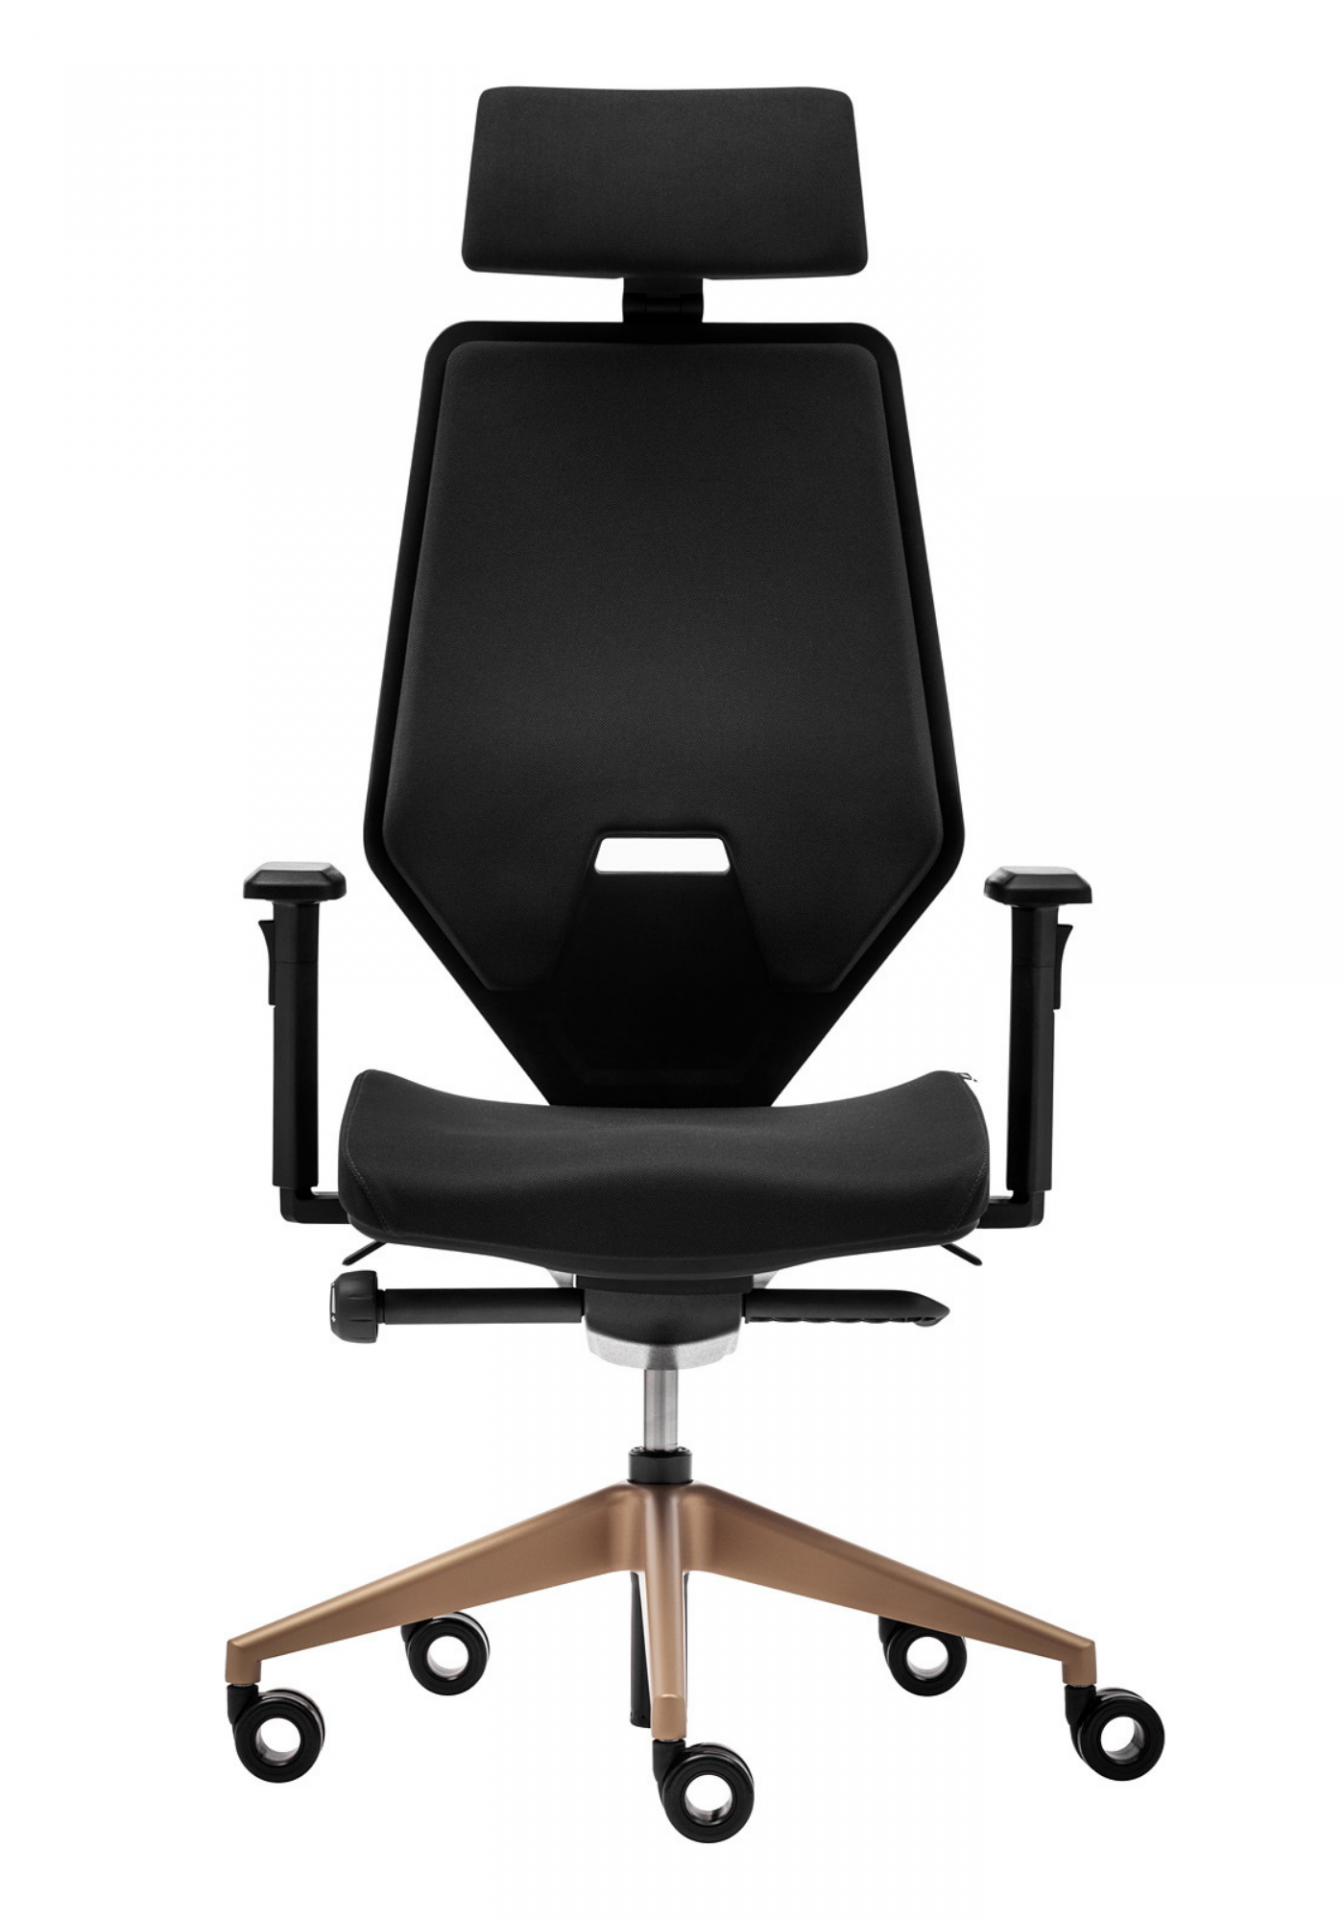 VANK_V6_swivel_chair_designalive14